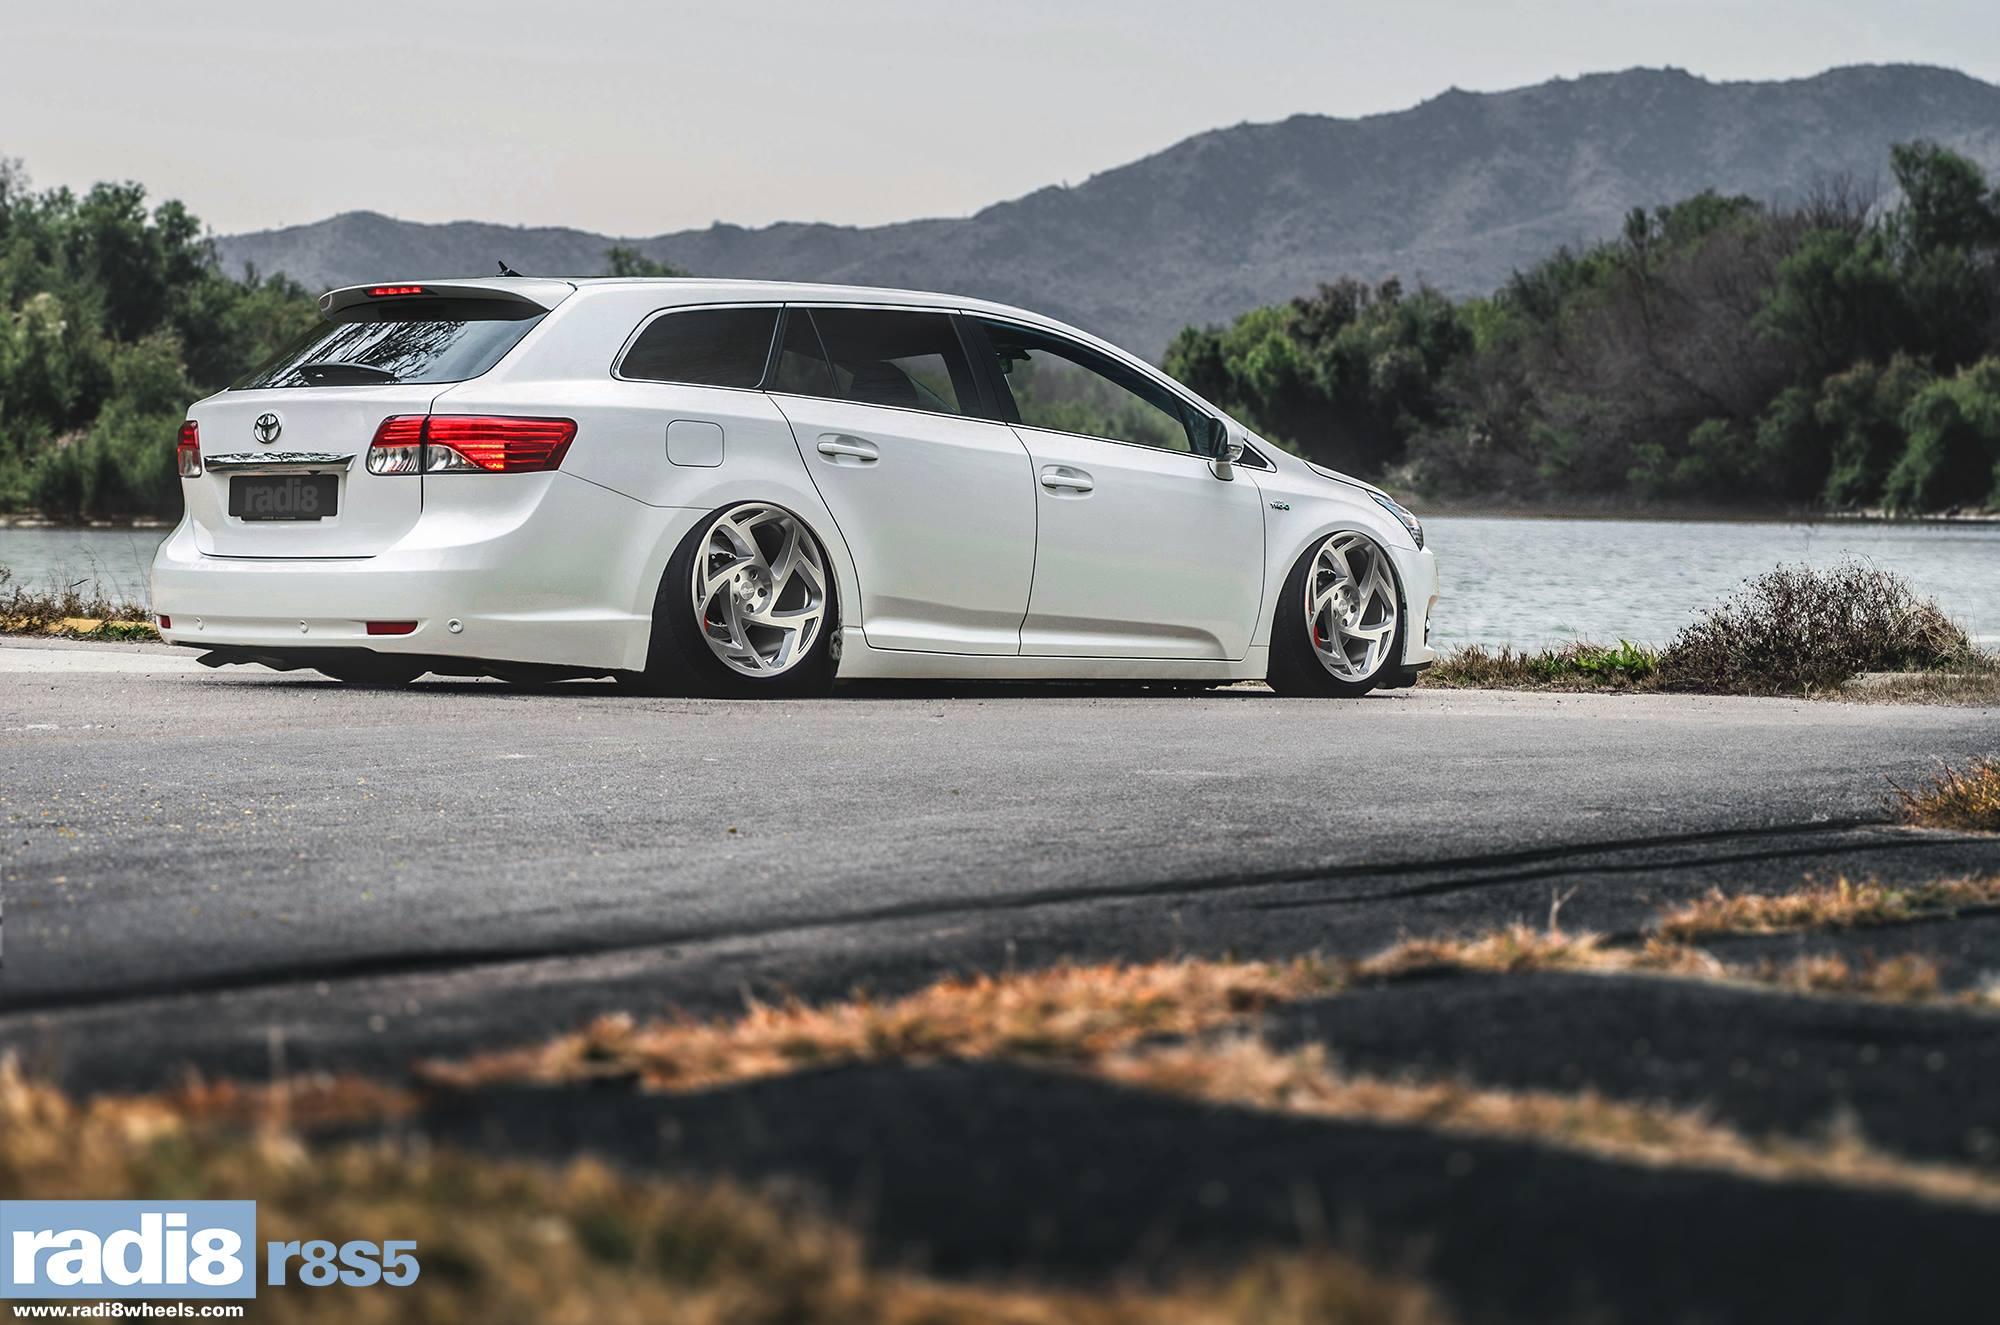 Radi8 R8S5 Wheels - Toyota Avensis Wagon